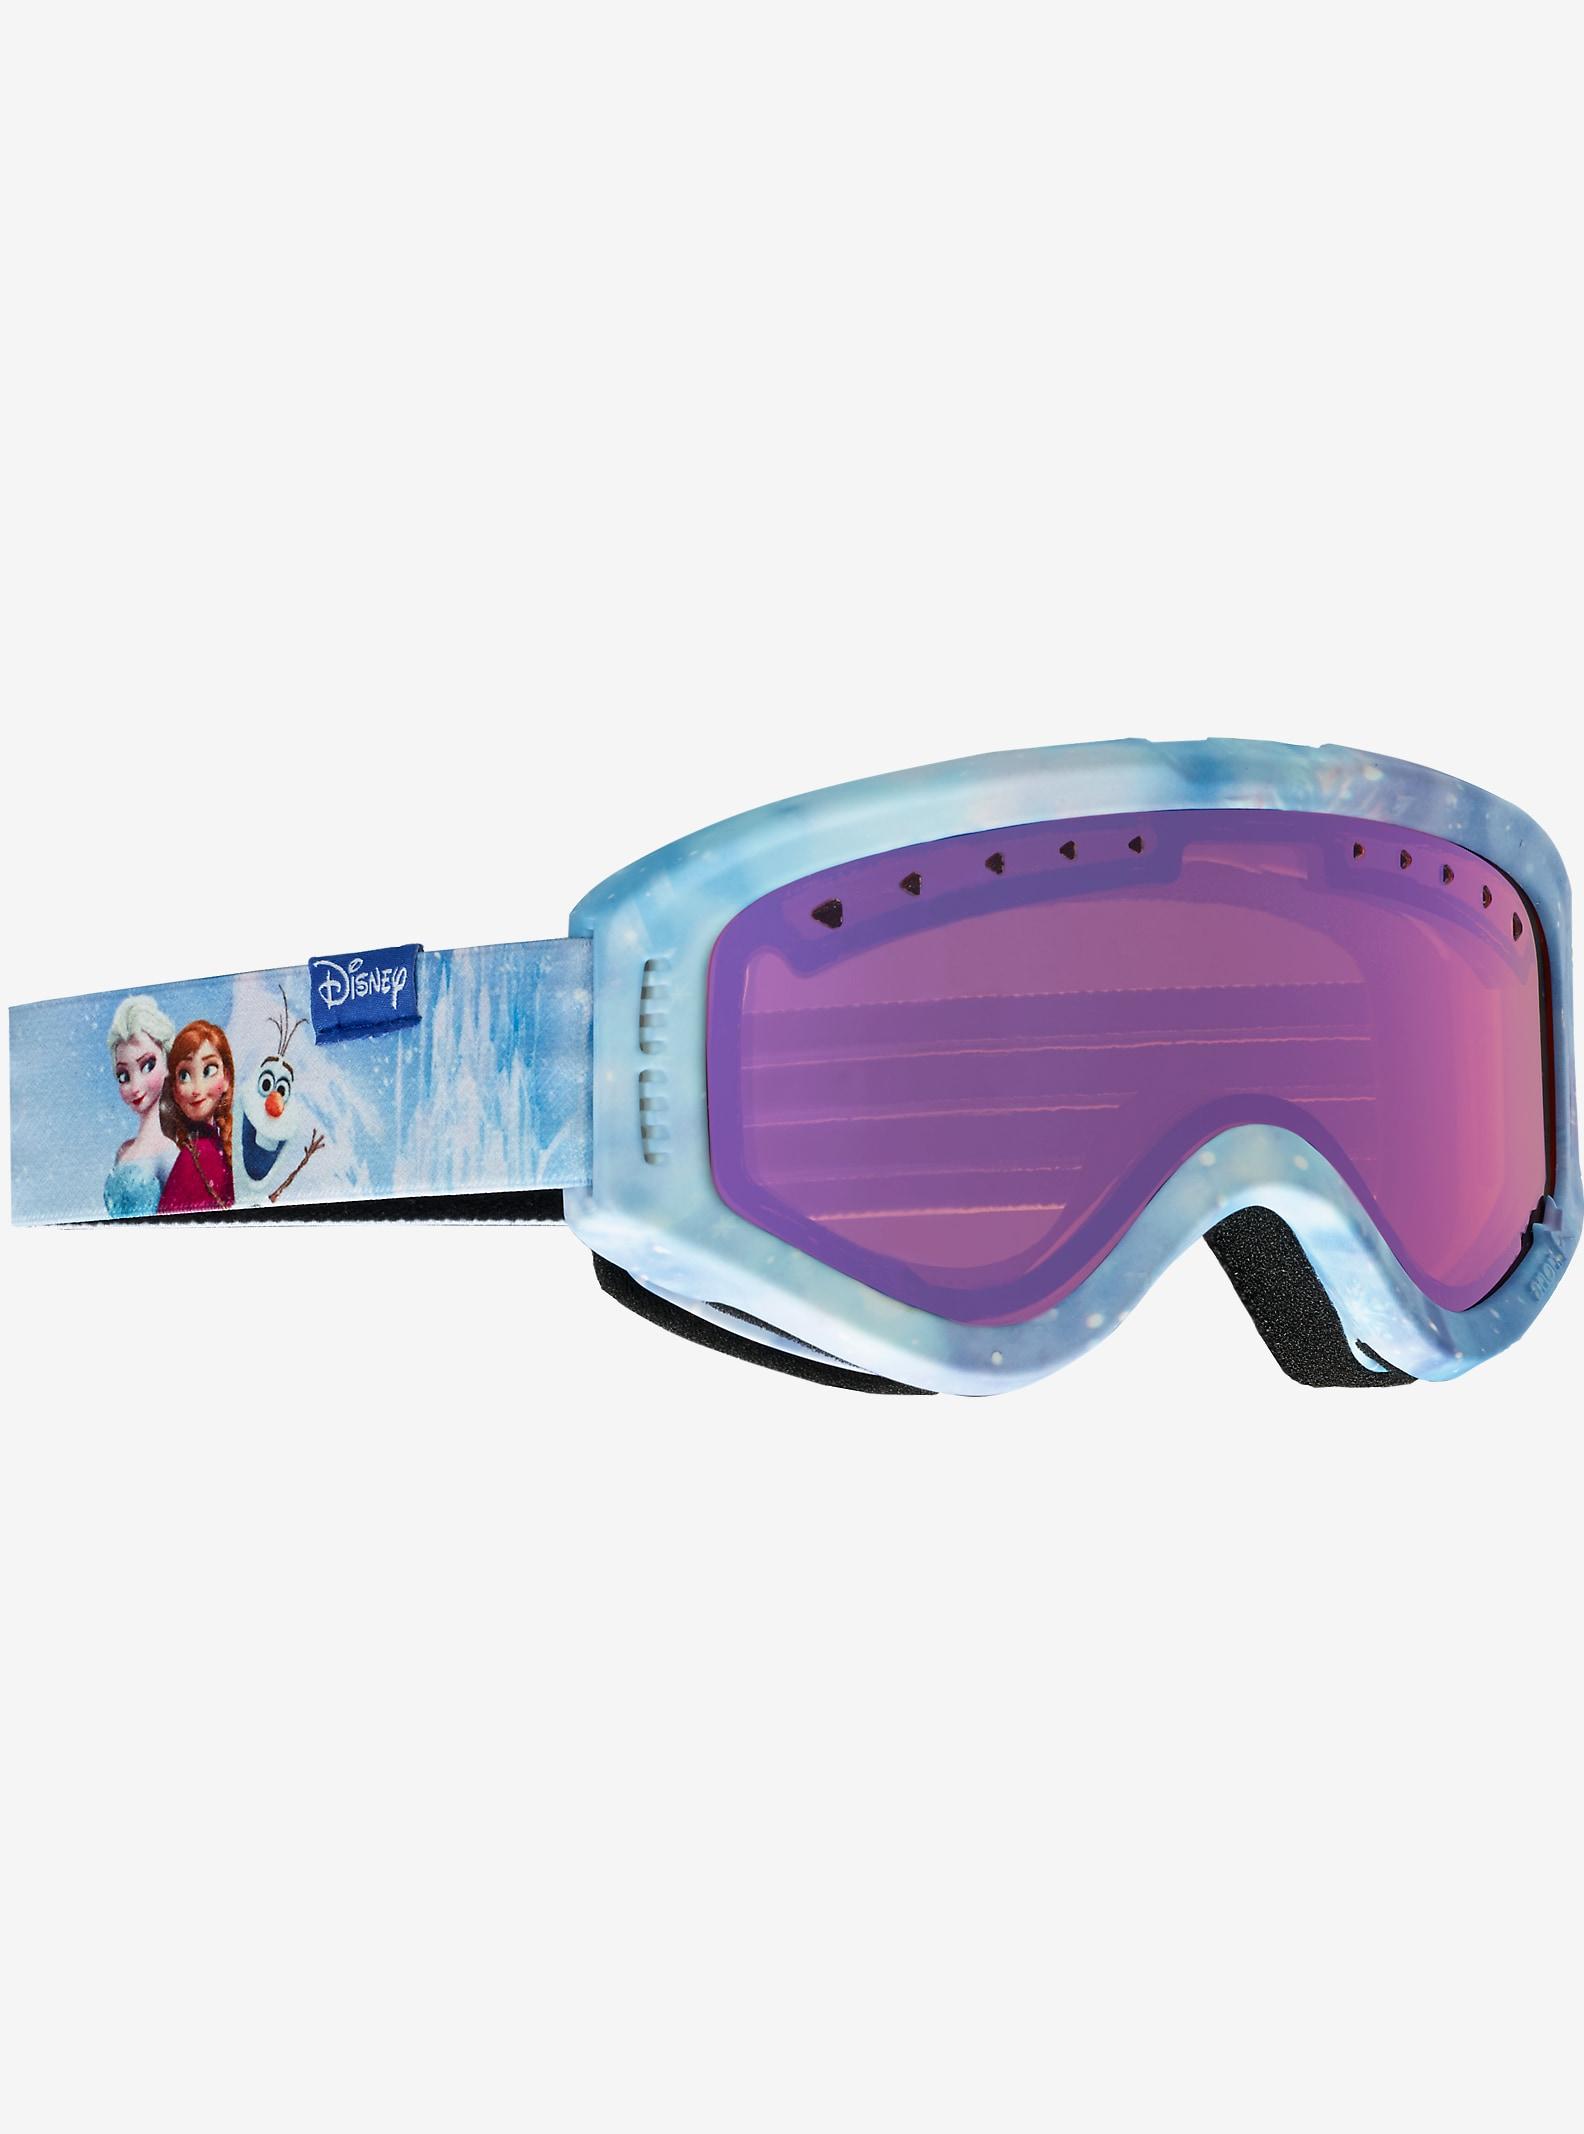 Disney Frozen Tracker Goggles by anon. shown in Frame: Frozen © Disney, Lens: Blue Amber